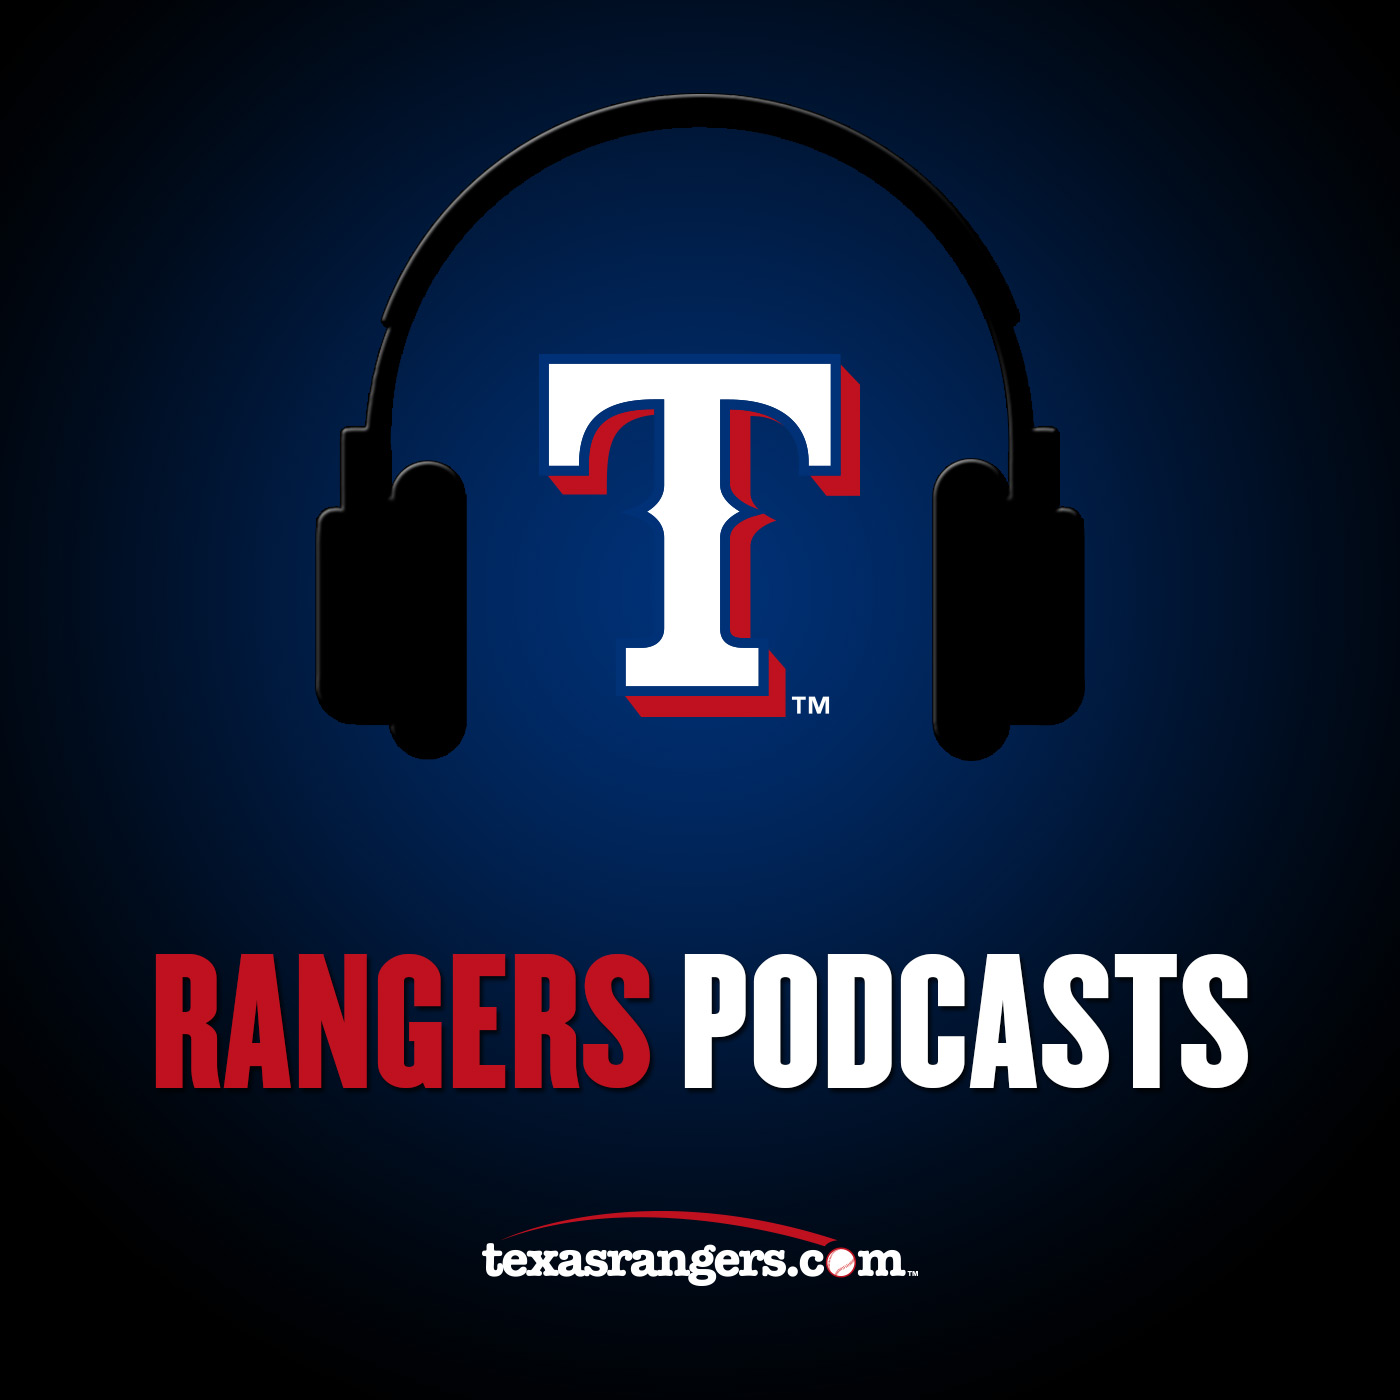 <![CDATA[Texas Rangers Podcast]]>